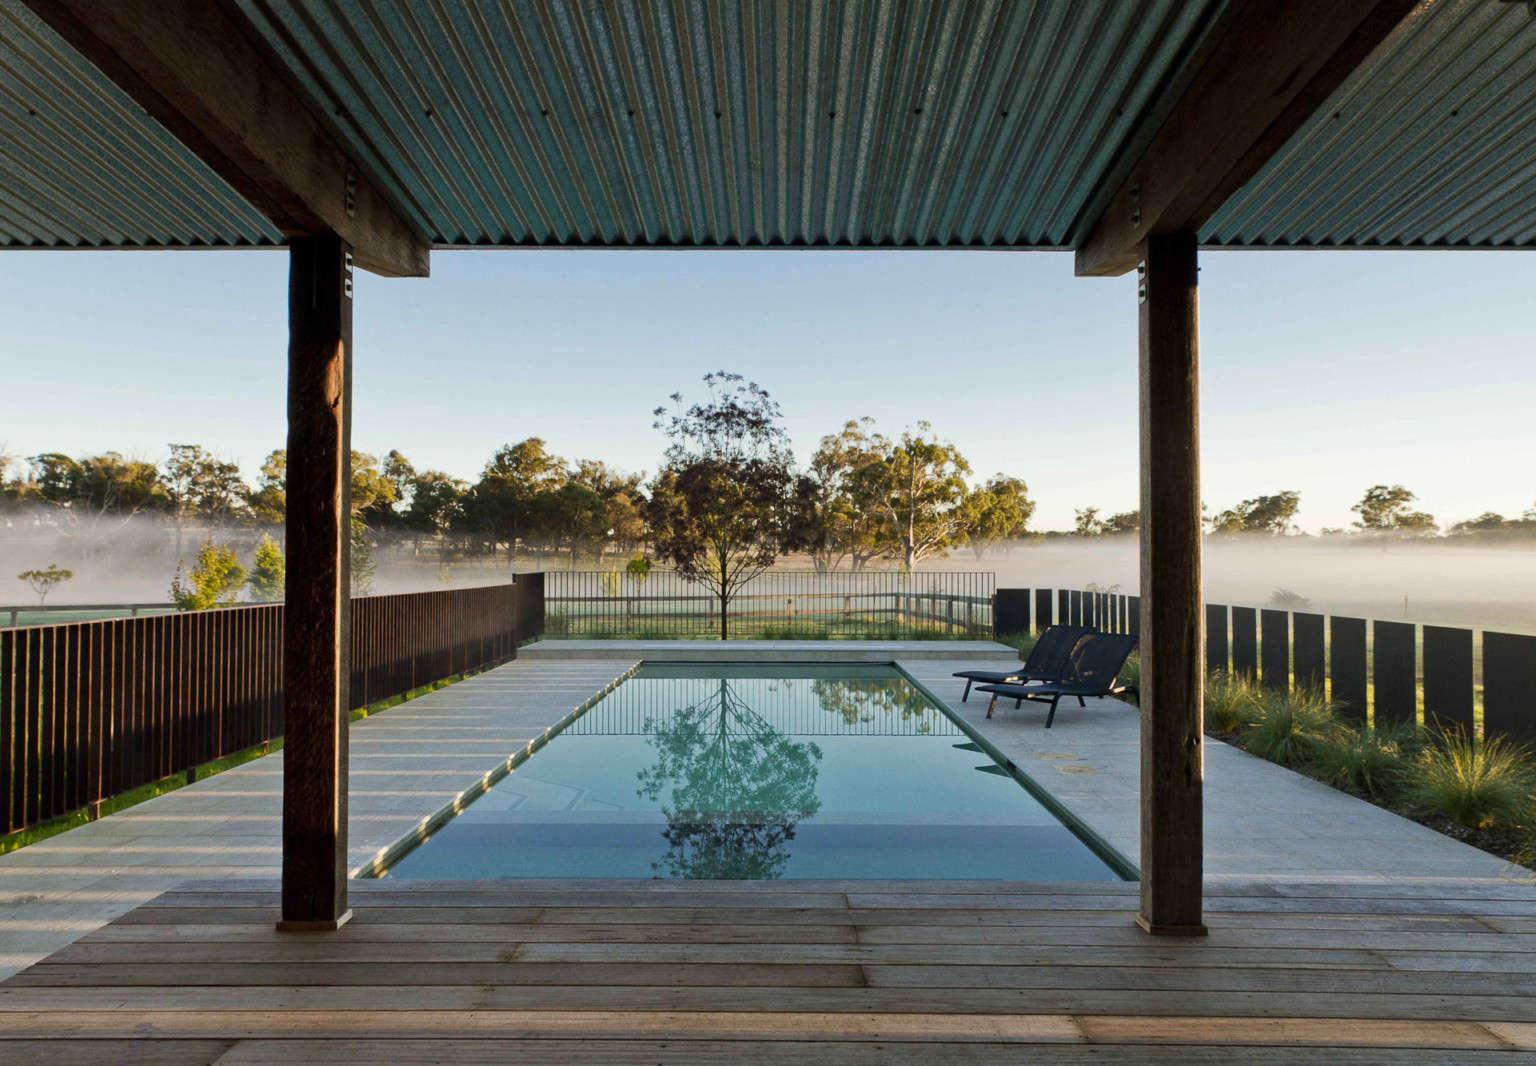 Australian Open: A Romantic Landscape In The Southern